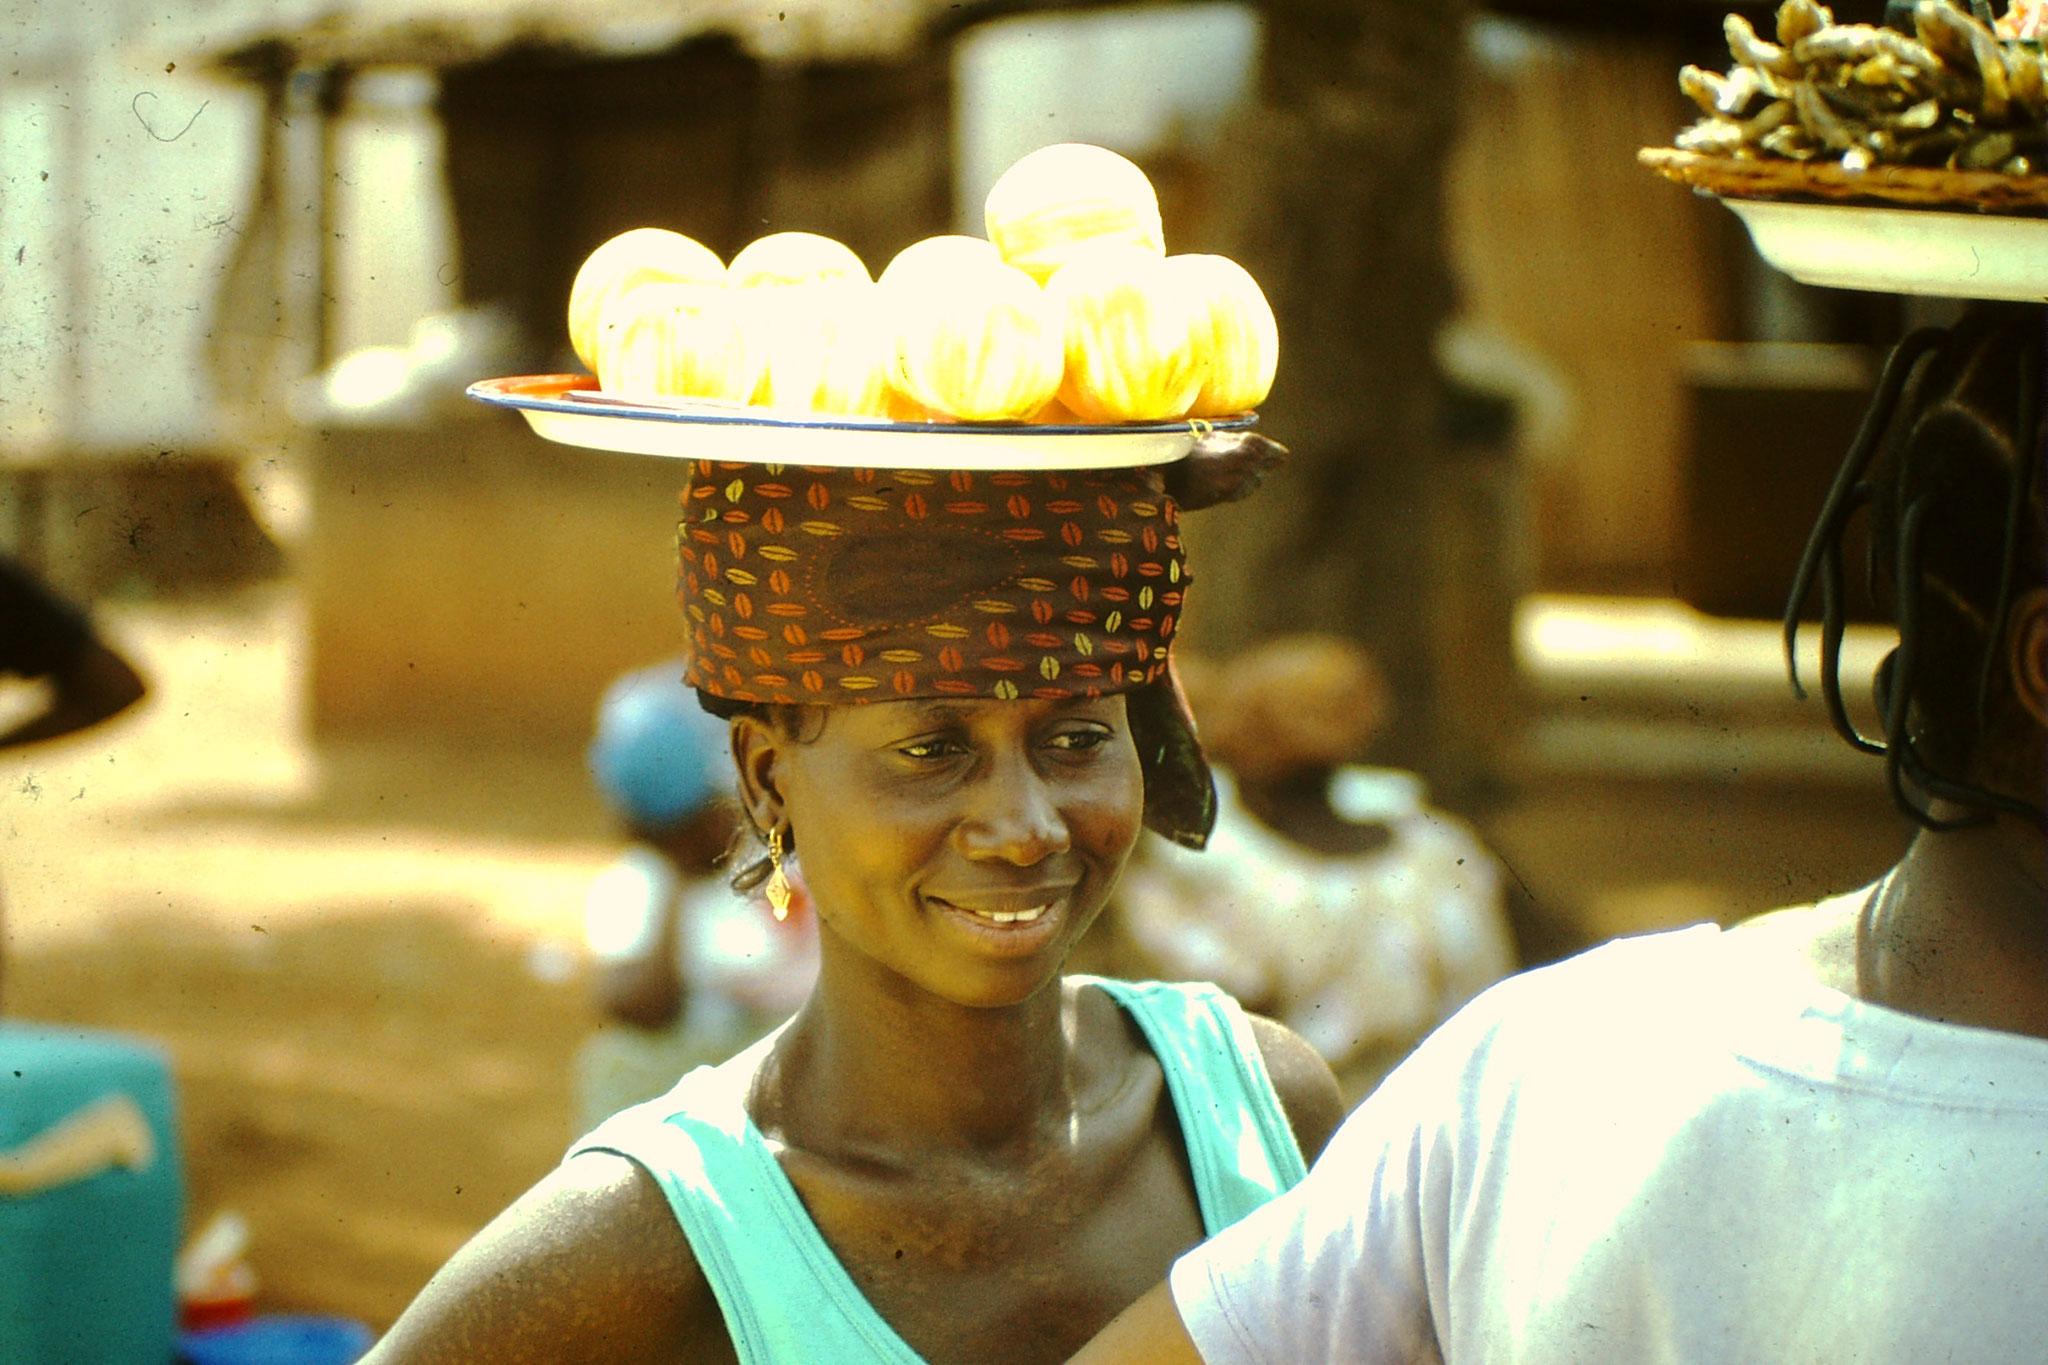 Orangenverkäuferin. Man nennt sie Ntiton.